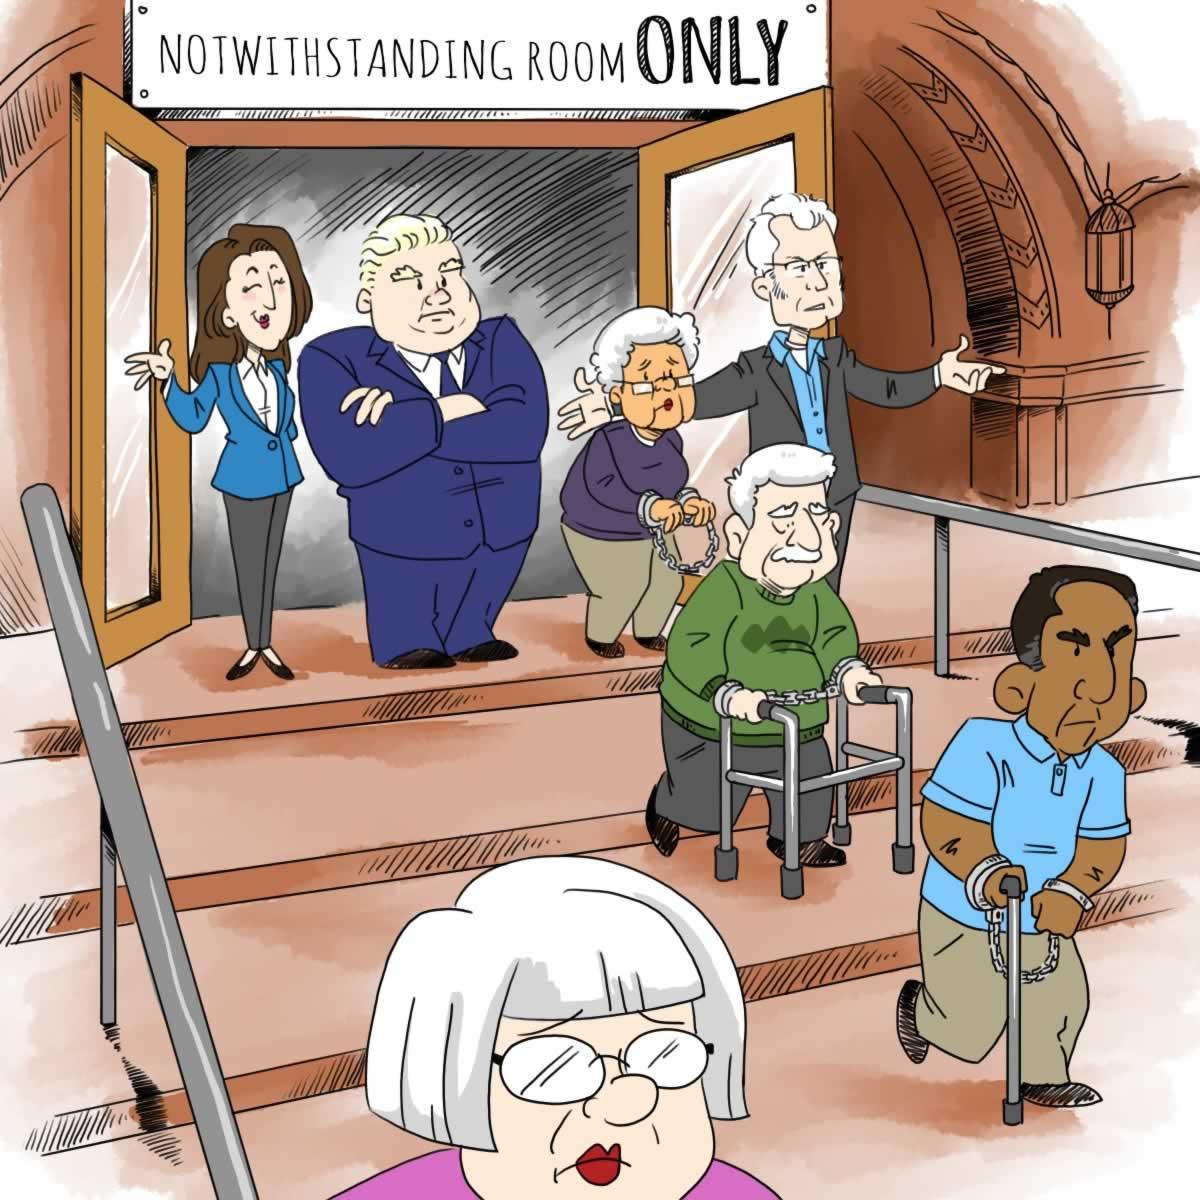 Notwithstanding room only cartoon